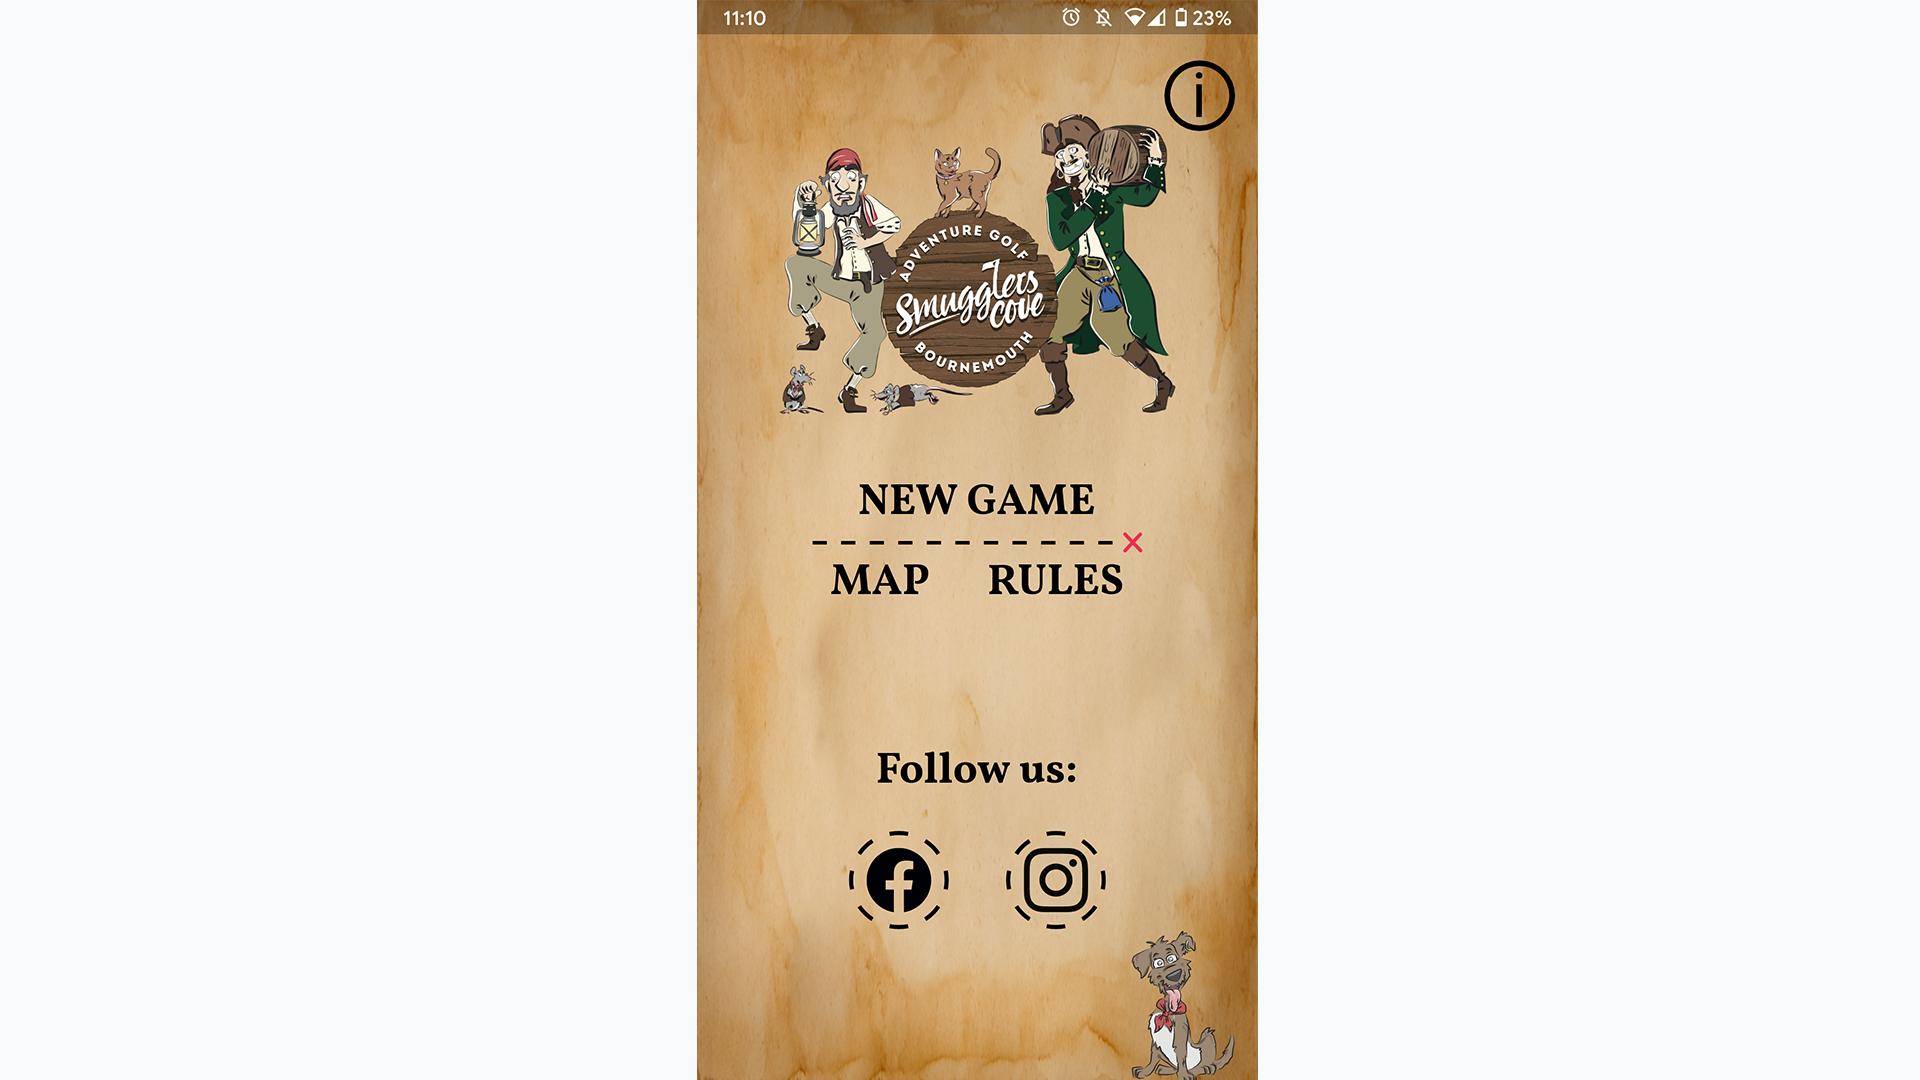 Smugglers Cove scorecard app homepage